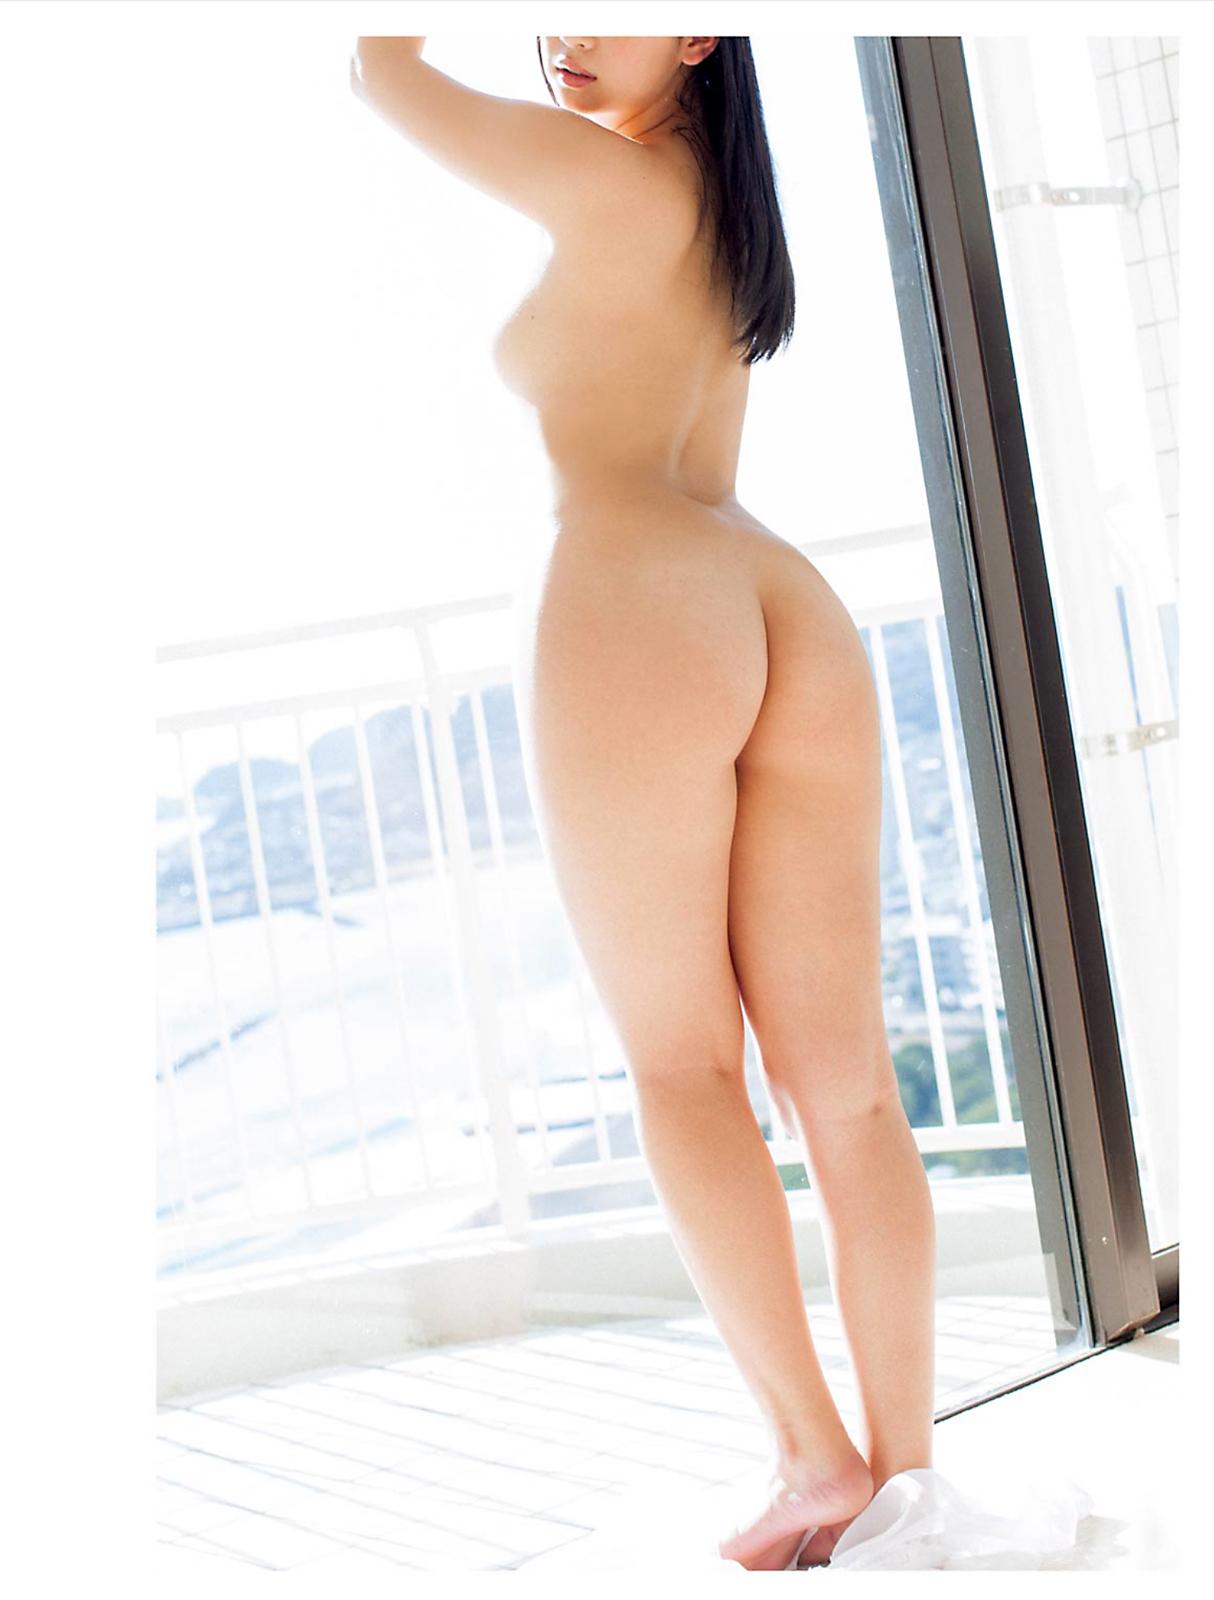 image http://scanlover.com/assets/images/4875-xuoHfBGmDf1IcbiN.jpeg